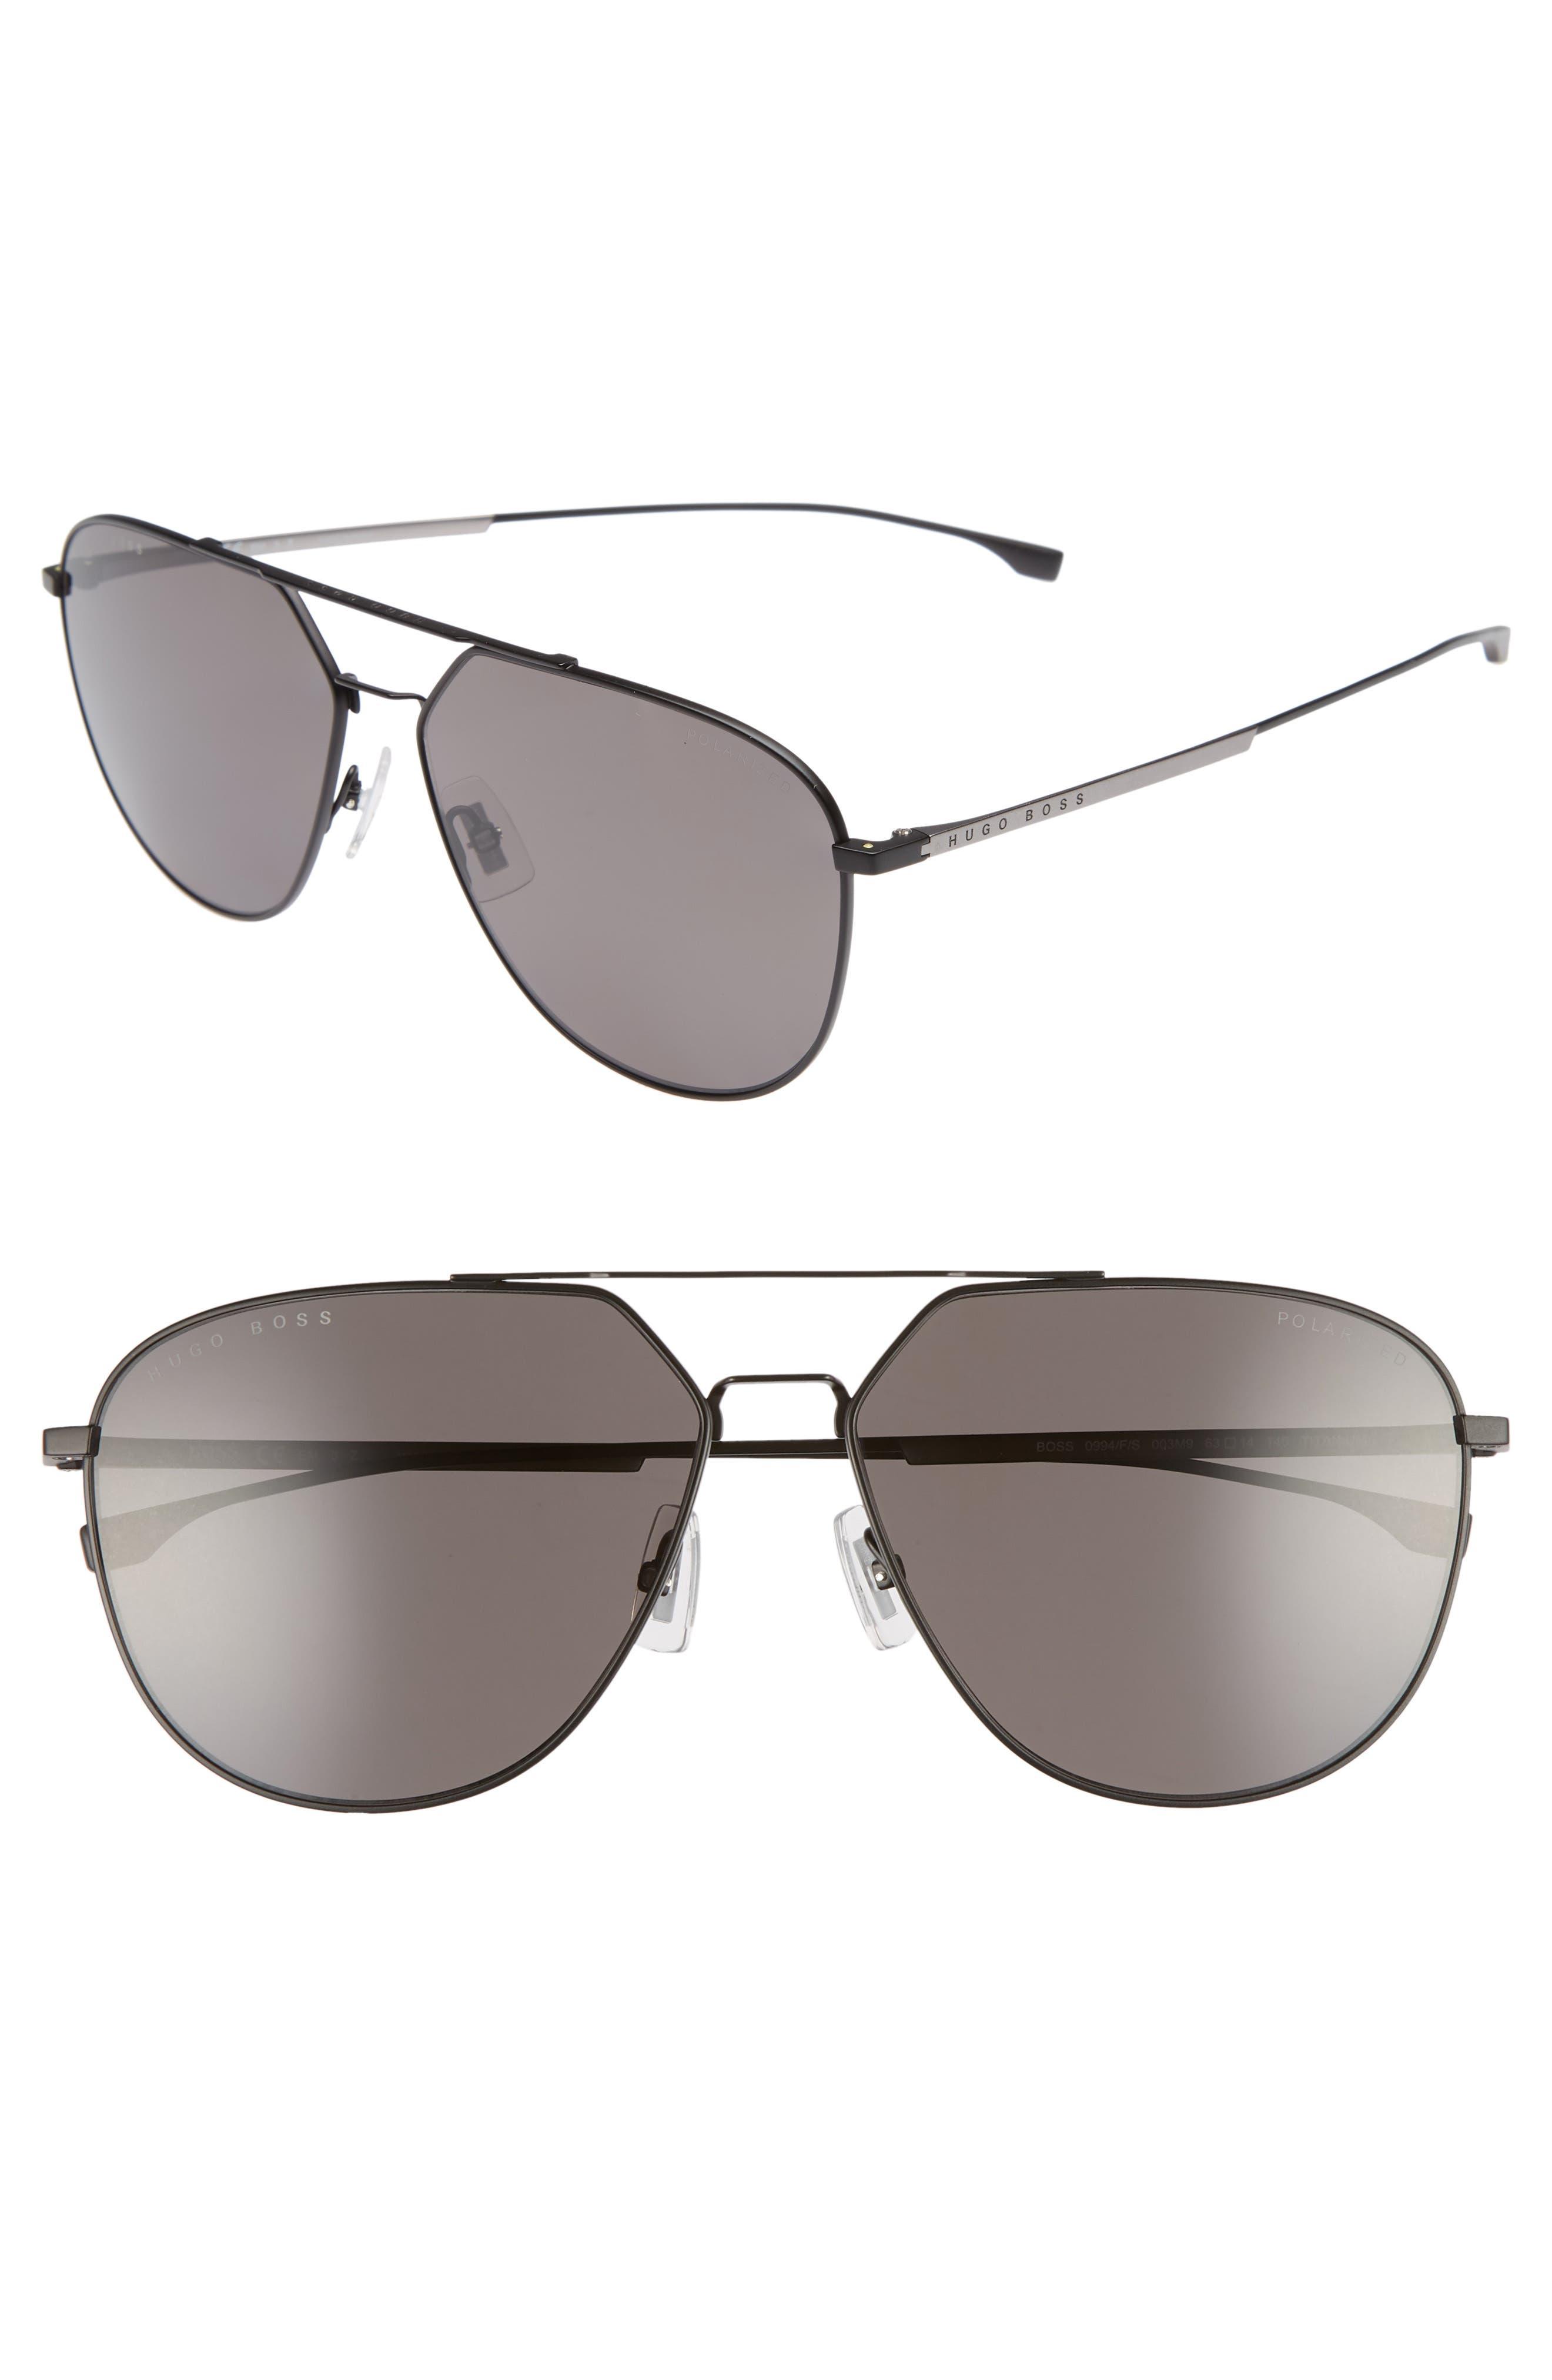 Main Image - BOSS 63mm Polarized Aviator Sunglasses